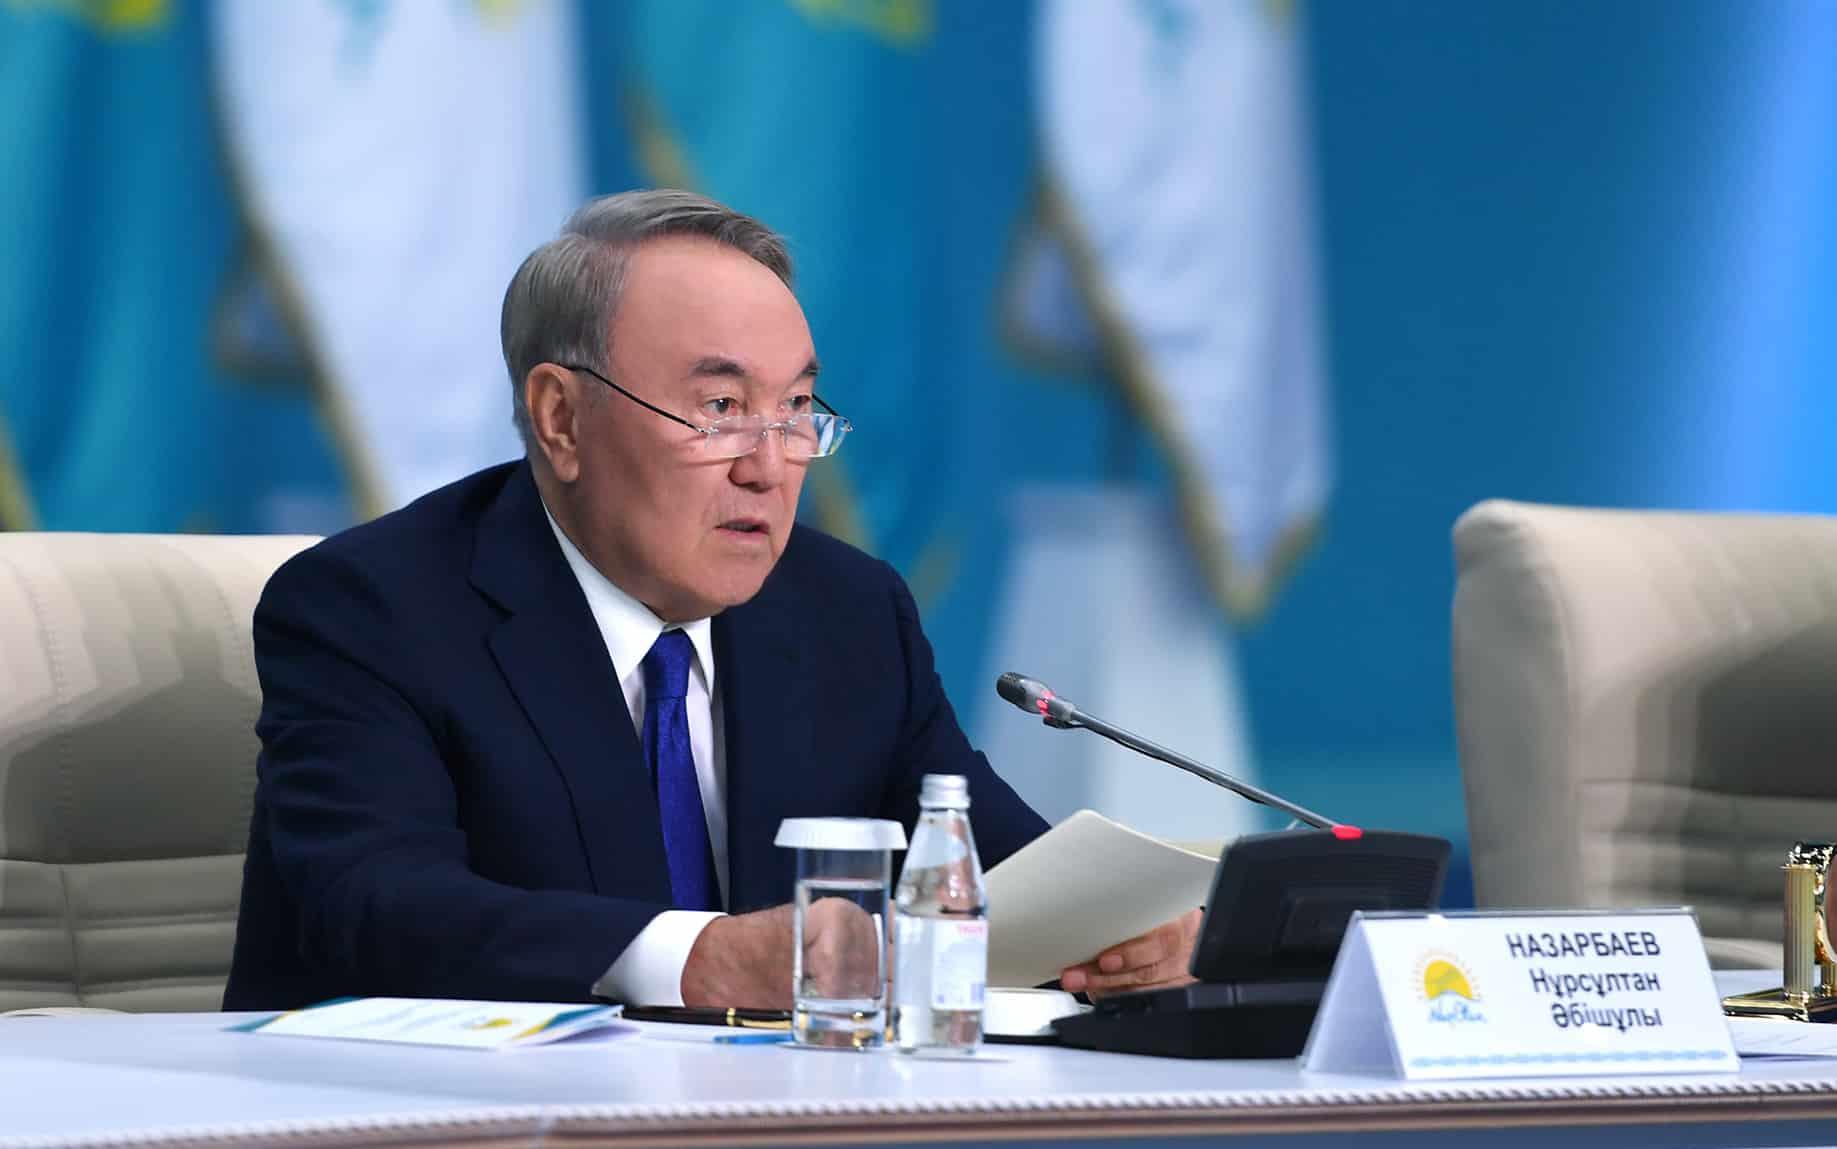 Нұрсұлтан Назарбаев Nur Otan партиясының кезектен тыс ХІХ съезінде